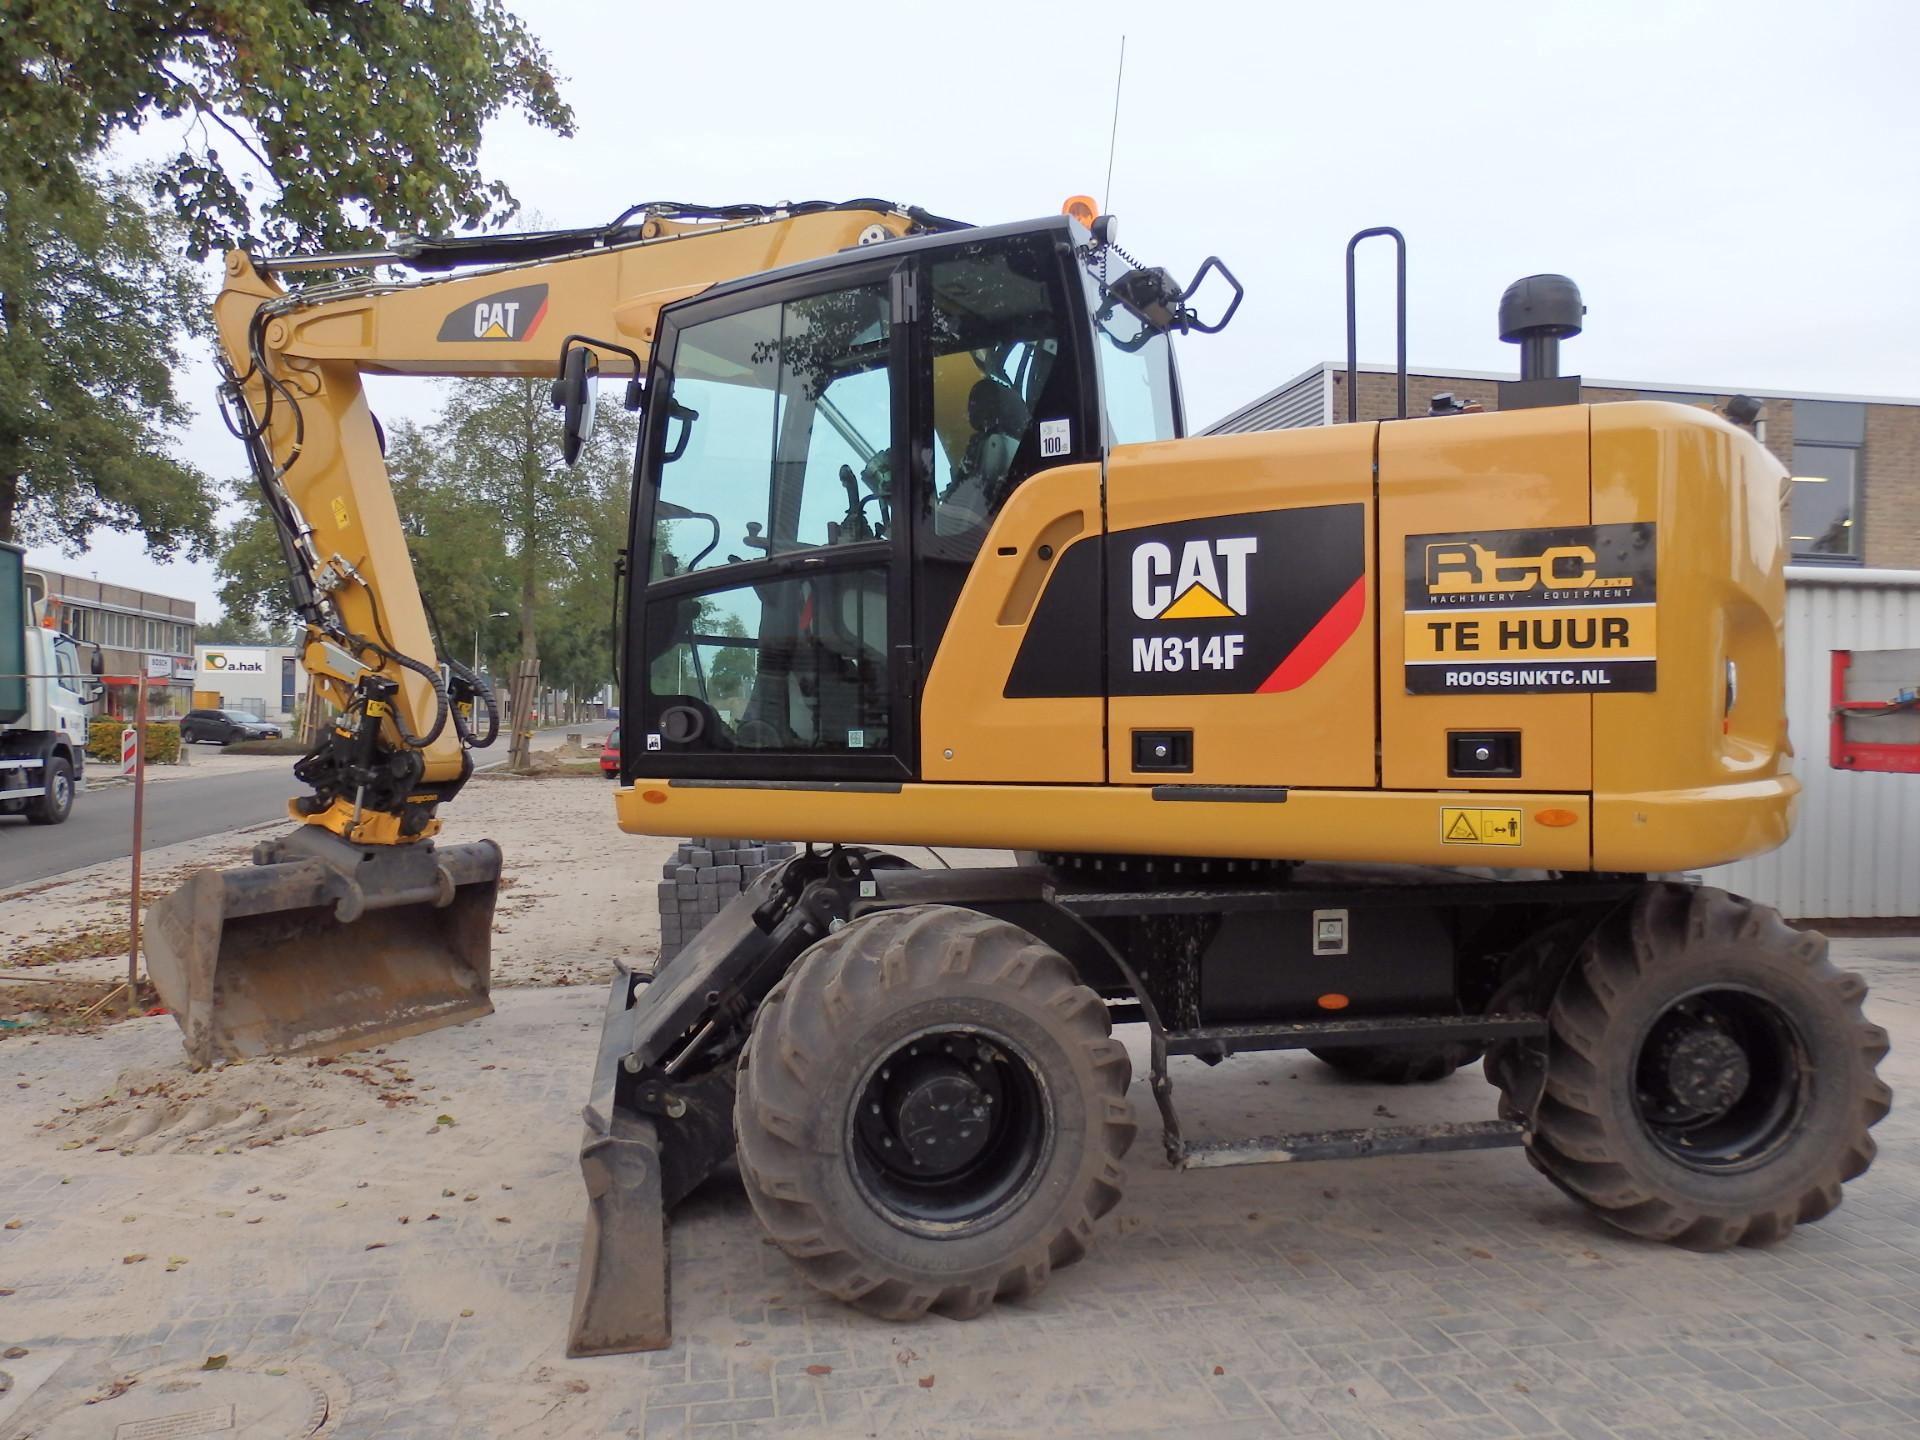 2 x Caterpillar 314F – Coming soon